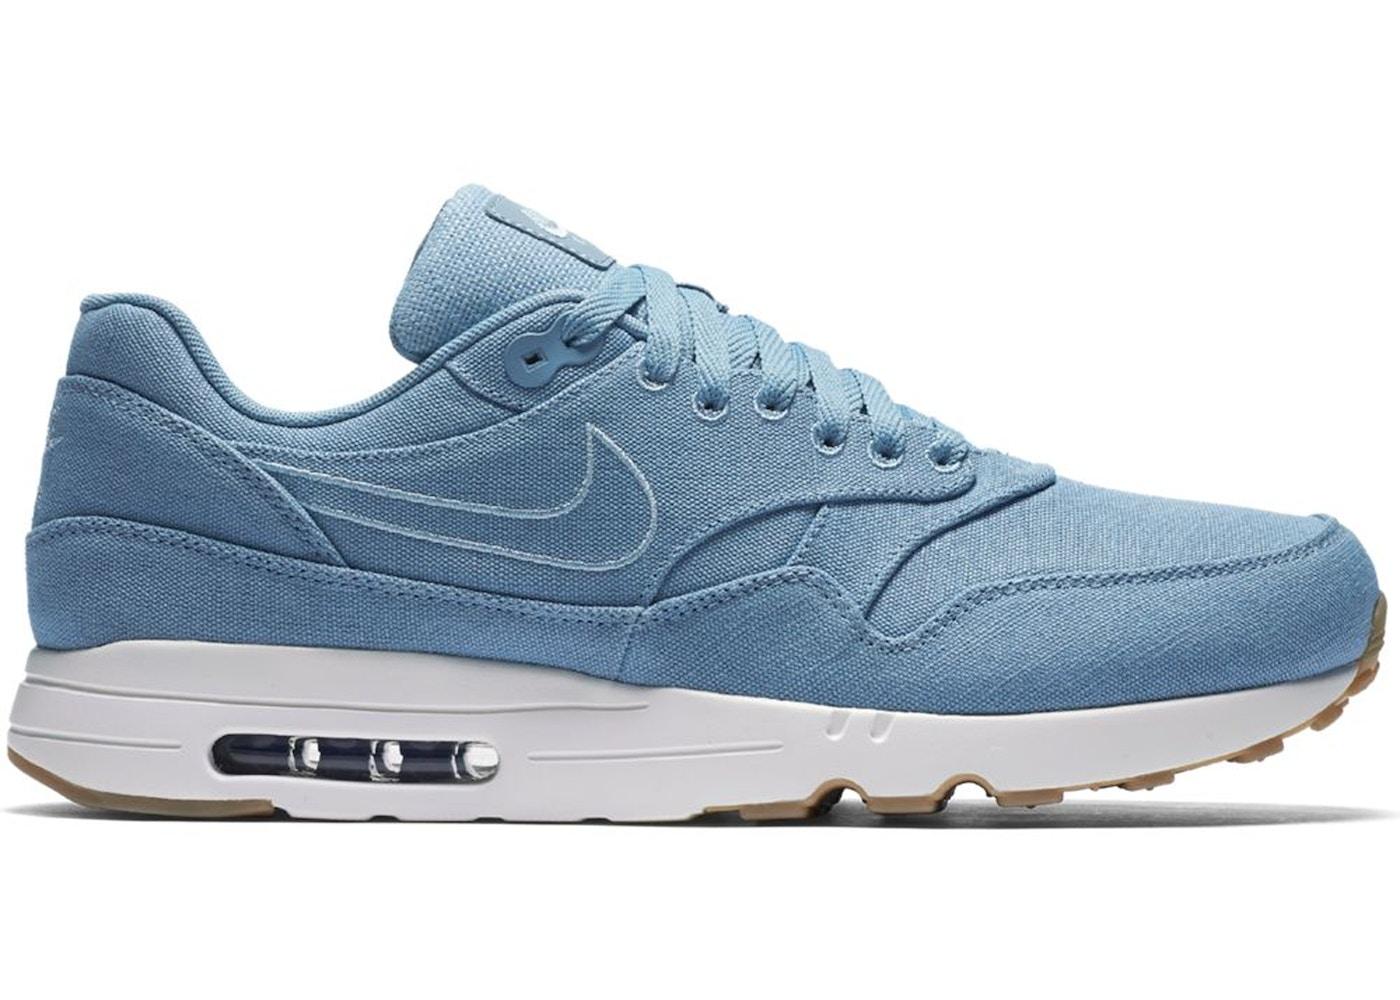 Nike Air Max 1 Ultra 2.0 Textile Mens Blue GreyLight